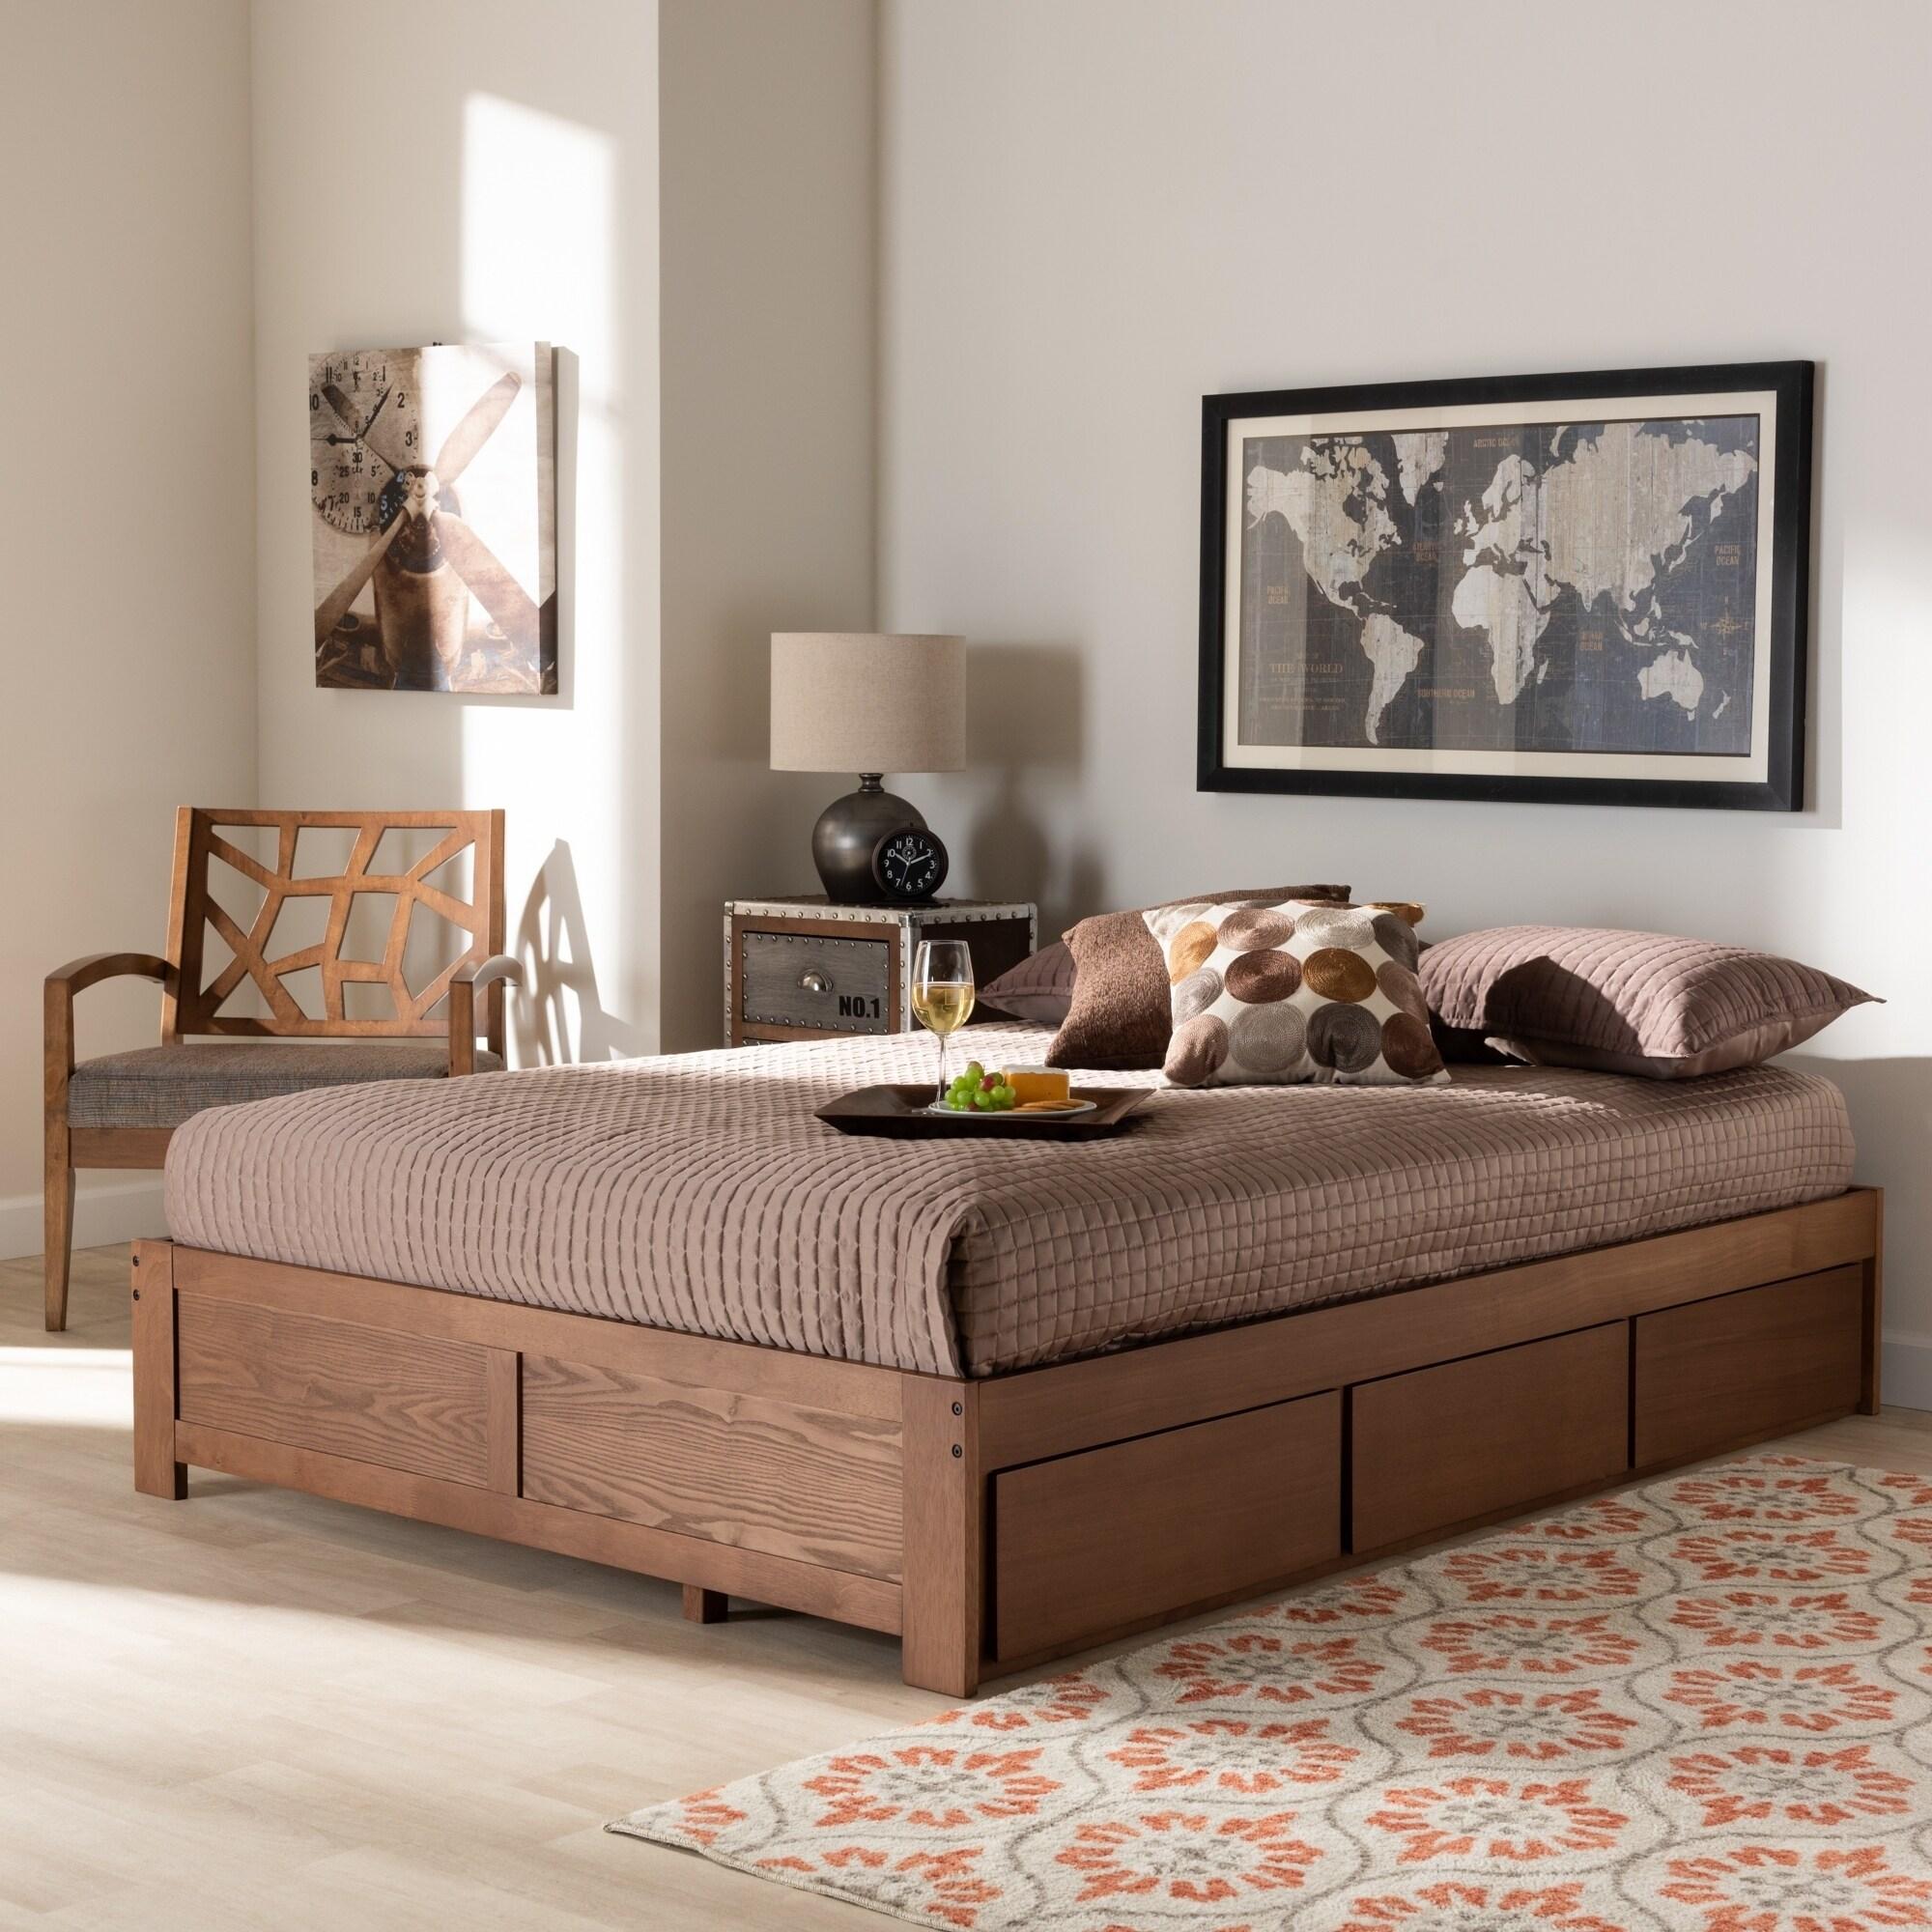 Wren Modern And Contemporary 3 Drawer Platform Storage Bed Frame Overstock 28744091 Full